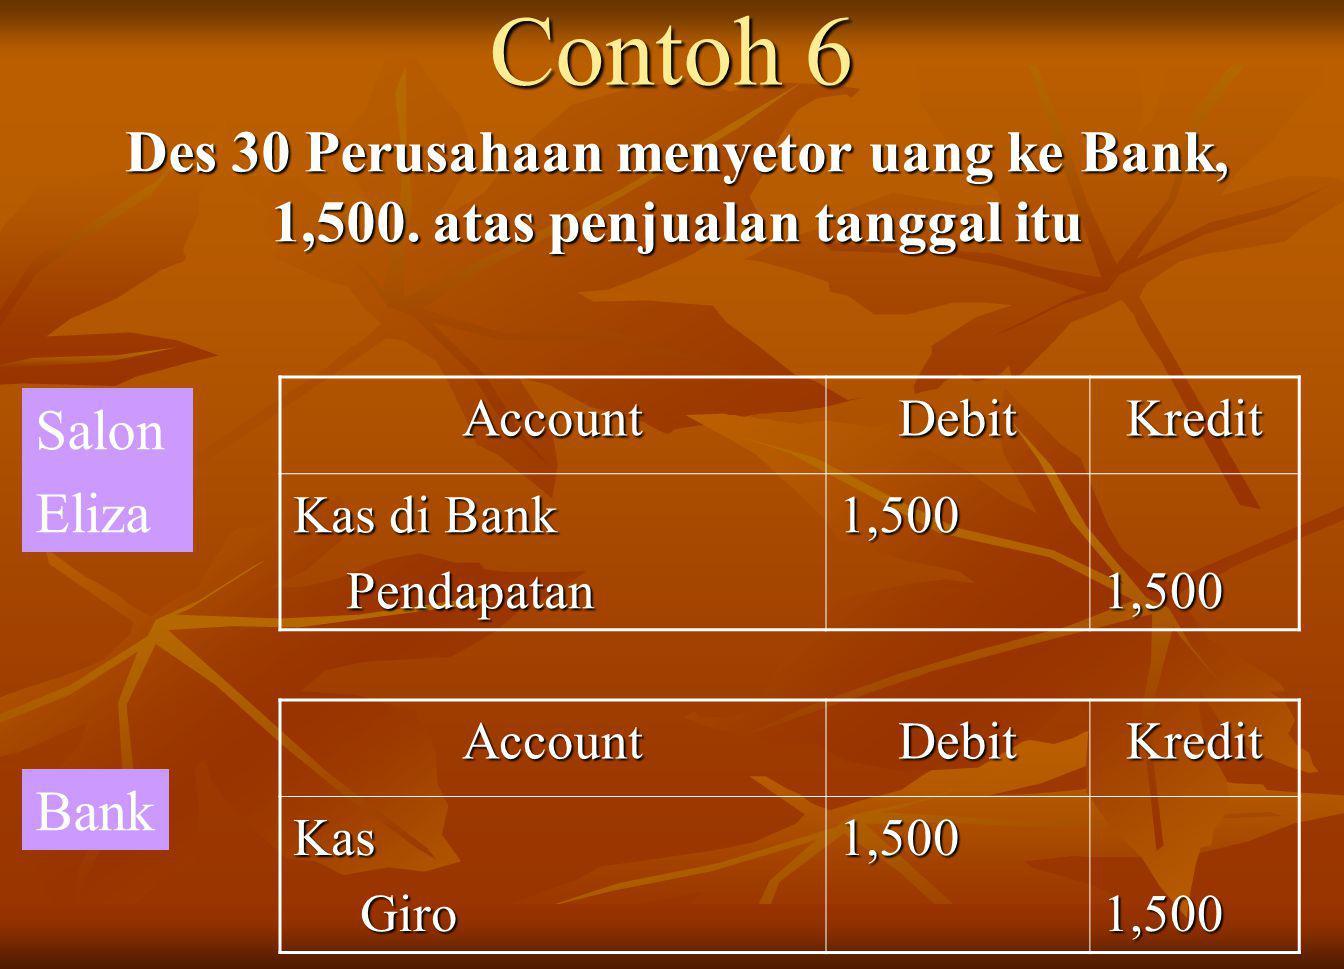 Contoh 6 Des 30 Perusahaan menyetor uang ke Bank, 1,500.